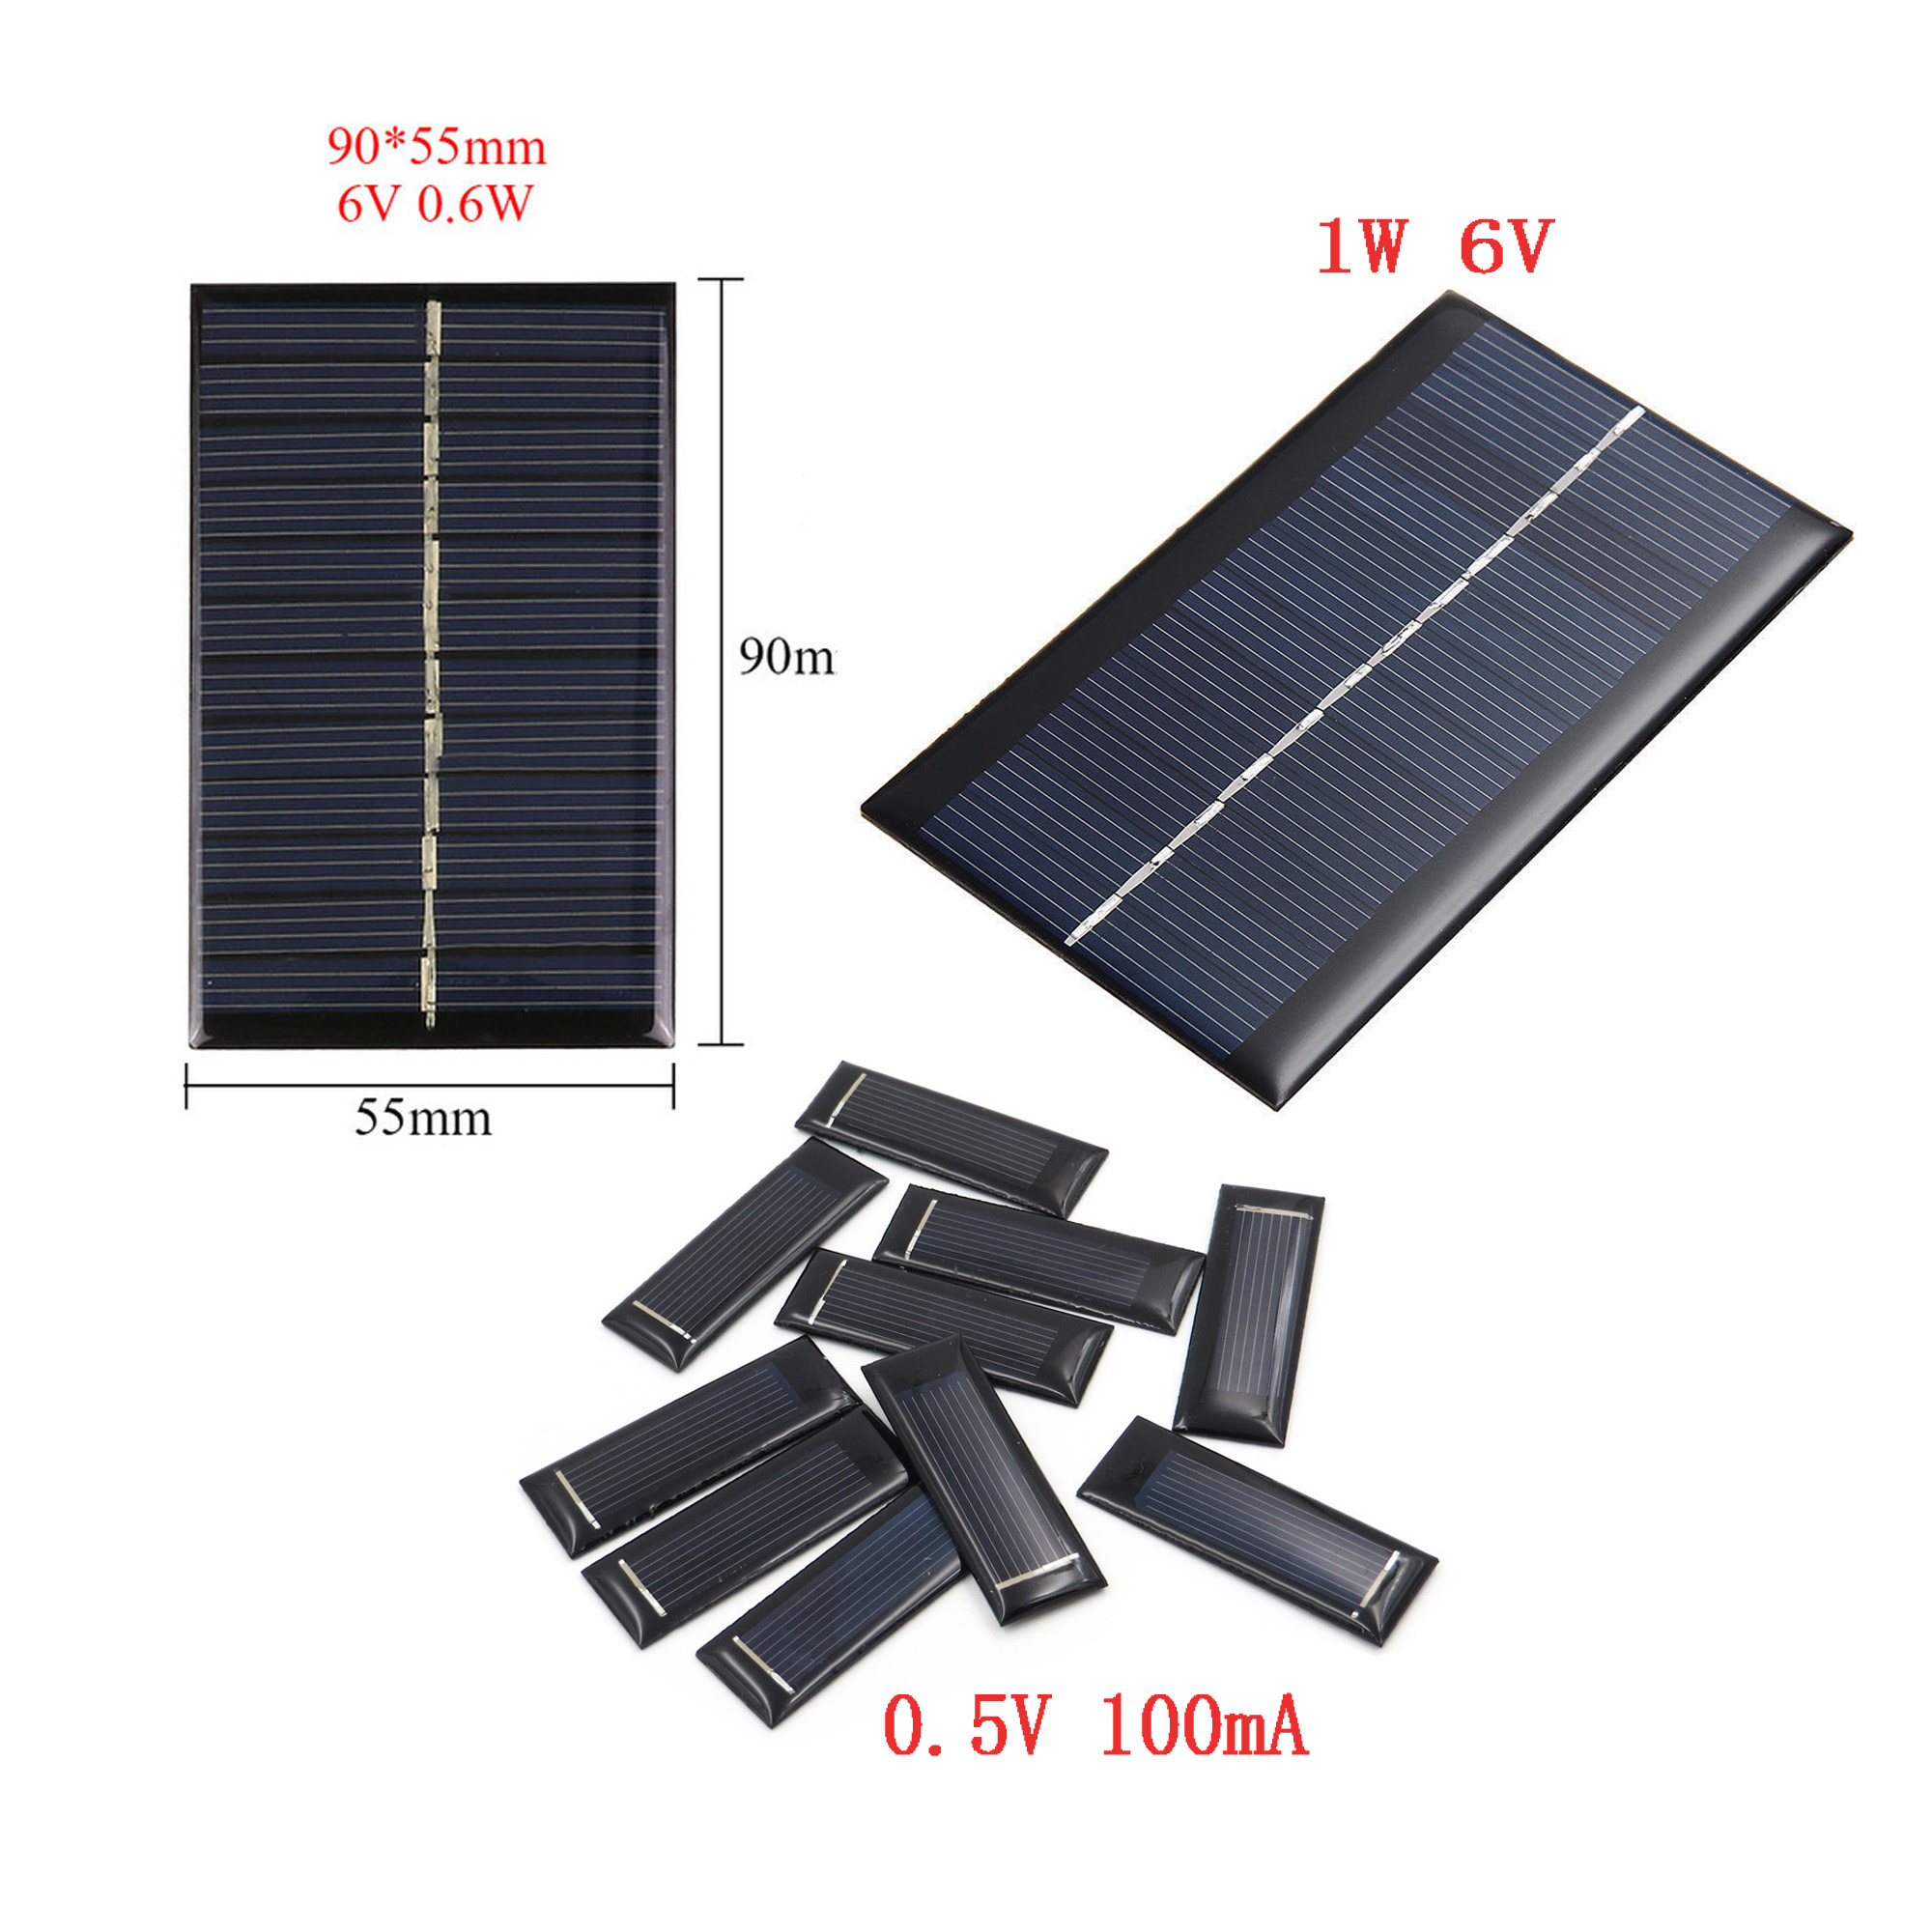 0 5v 100ma 0 6w 6v 1w 6v Solar Panels Battery Charge Solar Battery Panels Ebay